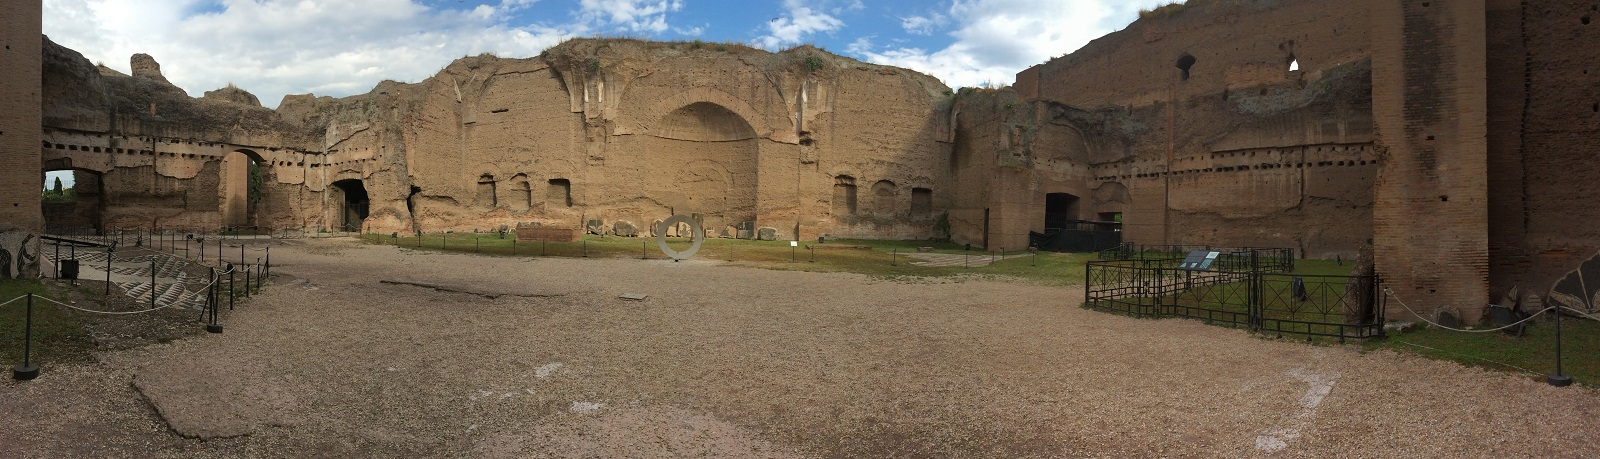 Termele lui Caracal - Roma